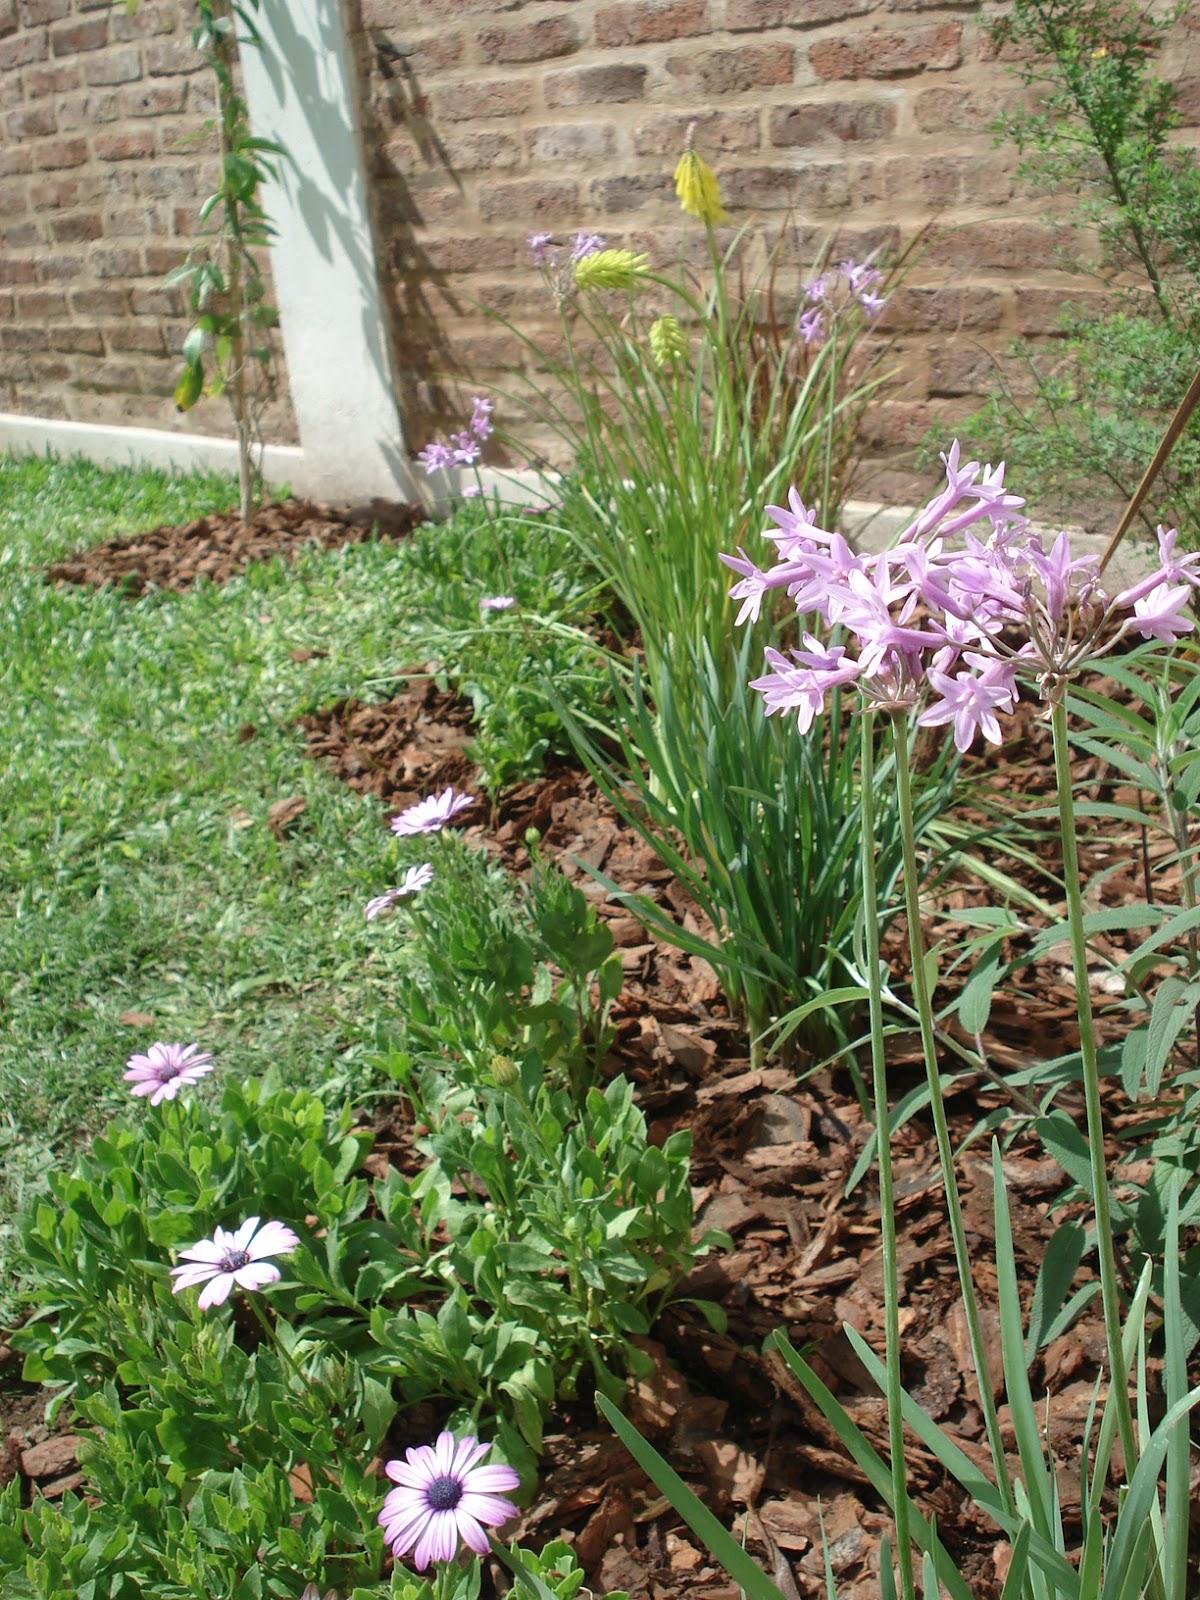 Reverdir jardineria y paisajismo jardin zig zag for Jardineria y paisajismo